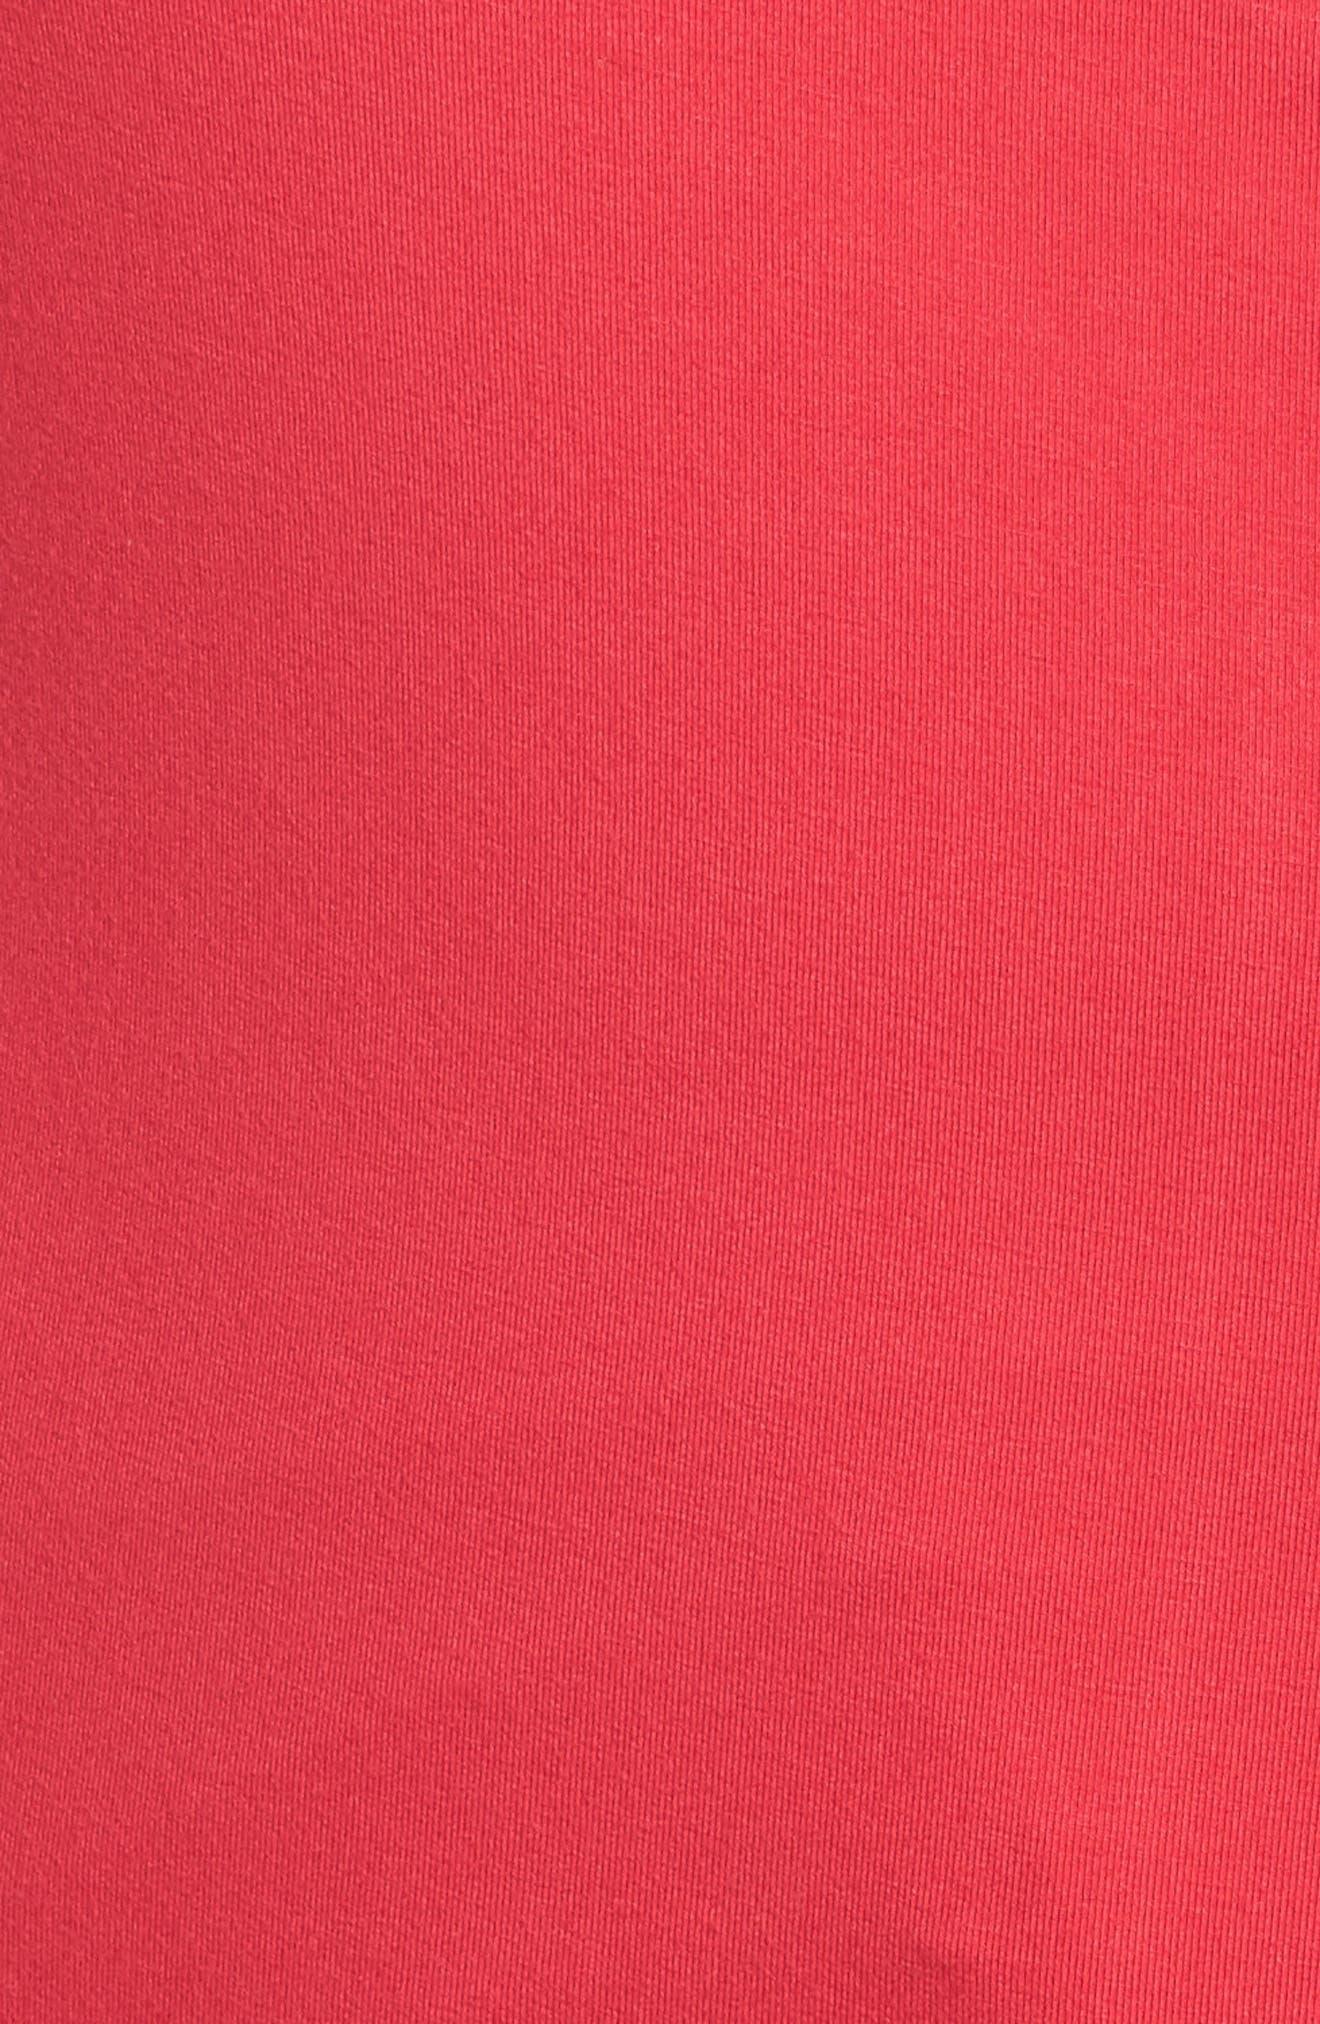 Surplice Knit Top,                             Alternate thumbnail 5, color,                             PINK ROSE